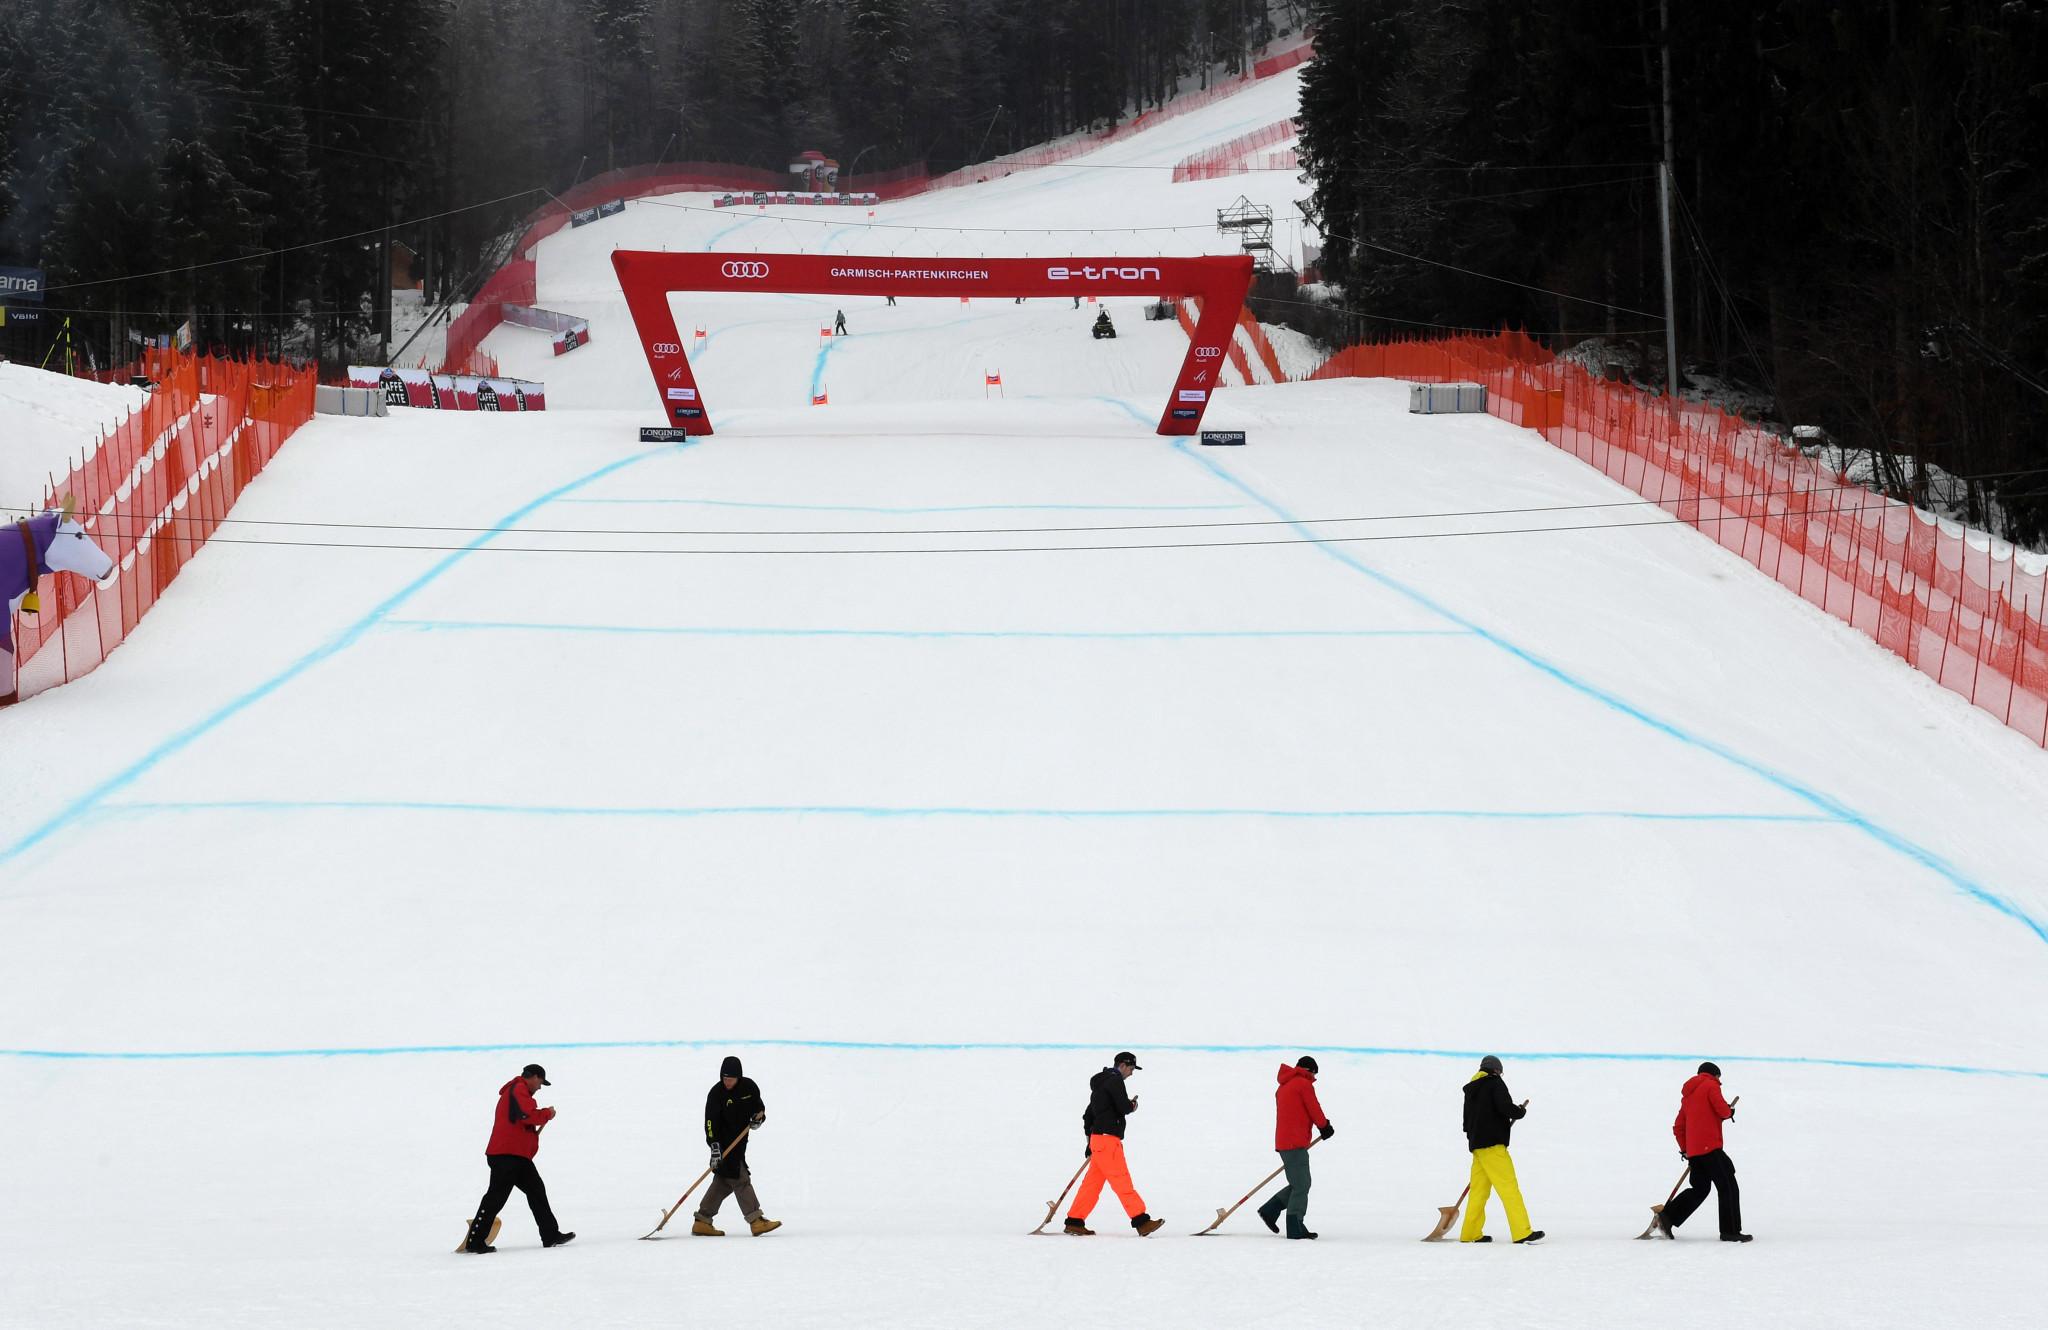 Garmisch-Partenkirchen is one of three candidates vying to host the 2025 Alpine World Ski Championships ©Getty Images